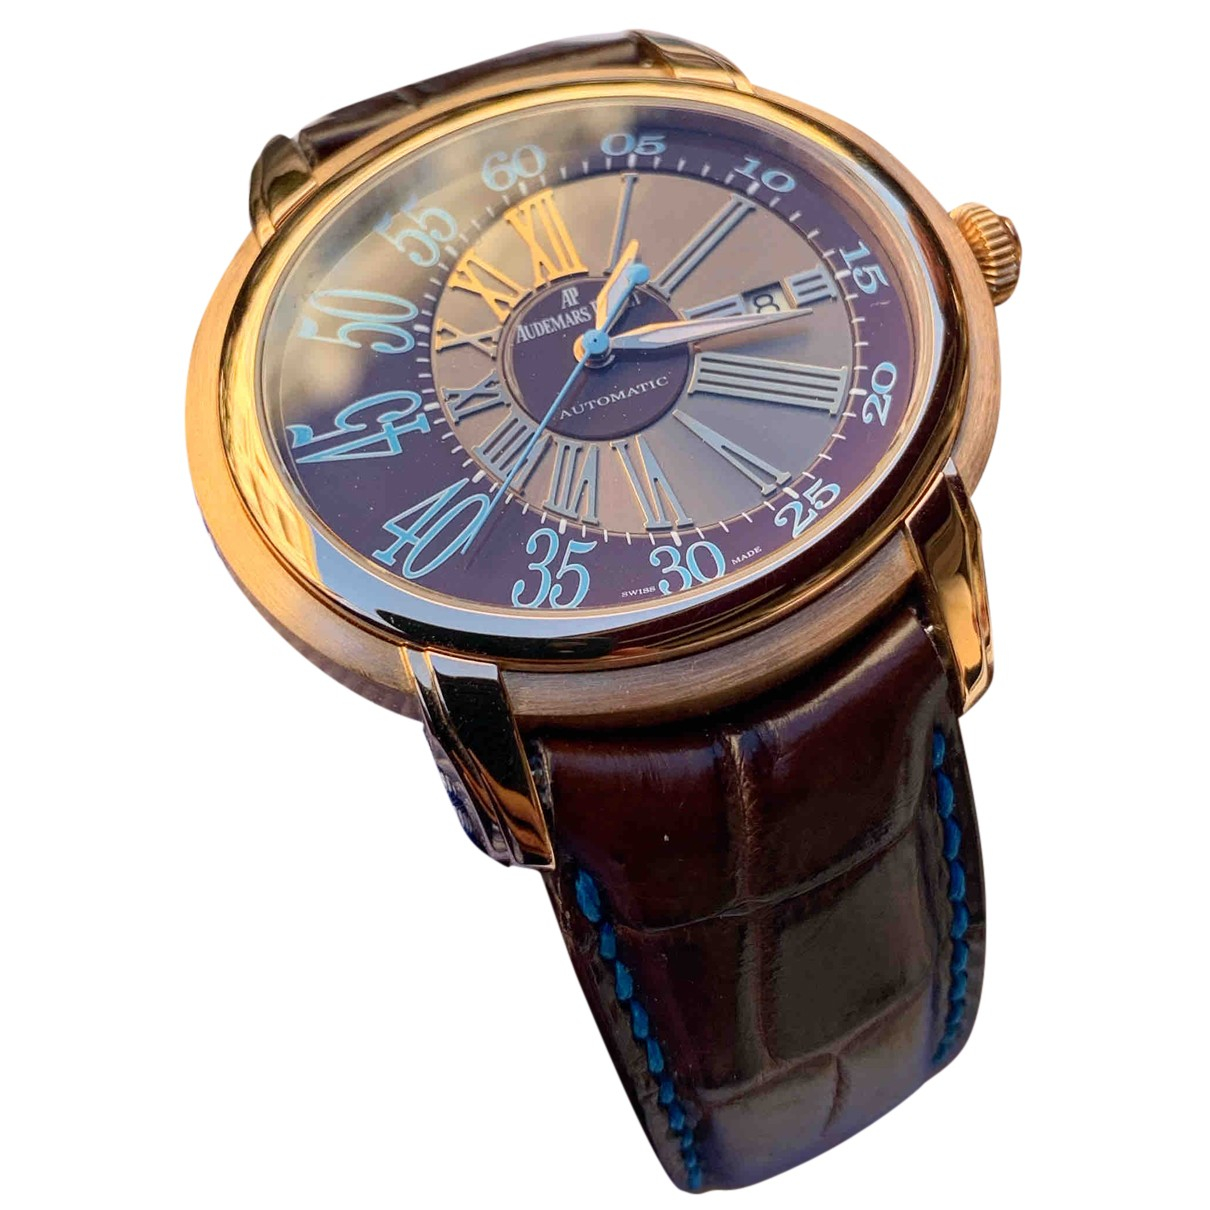 Relojes Millenary de Oro rosa Audemars Piguet